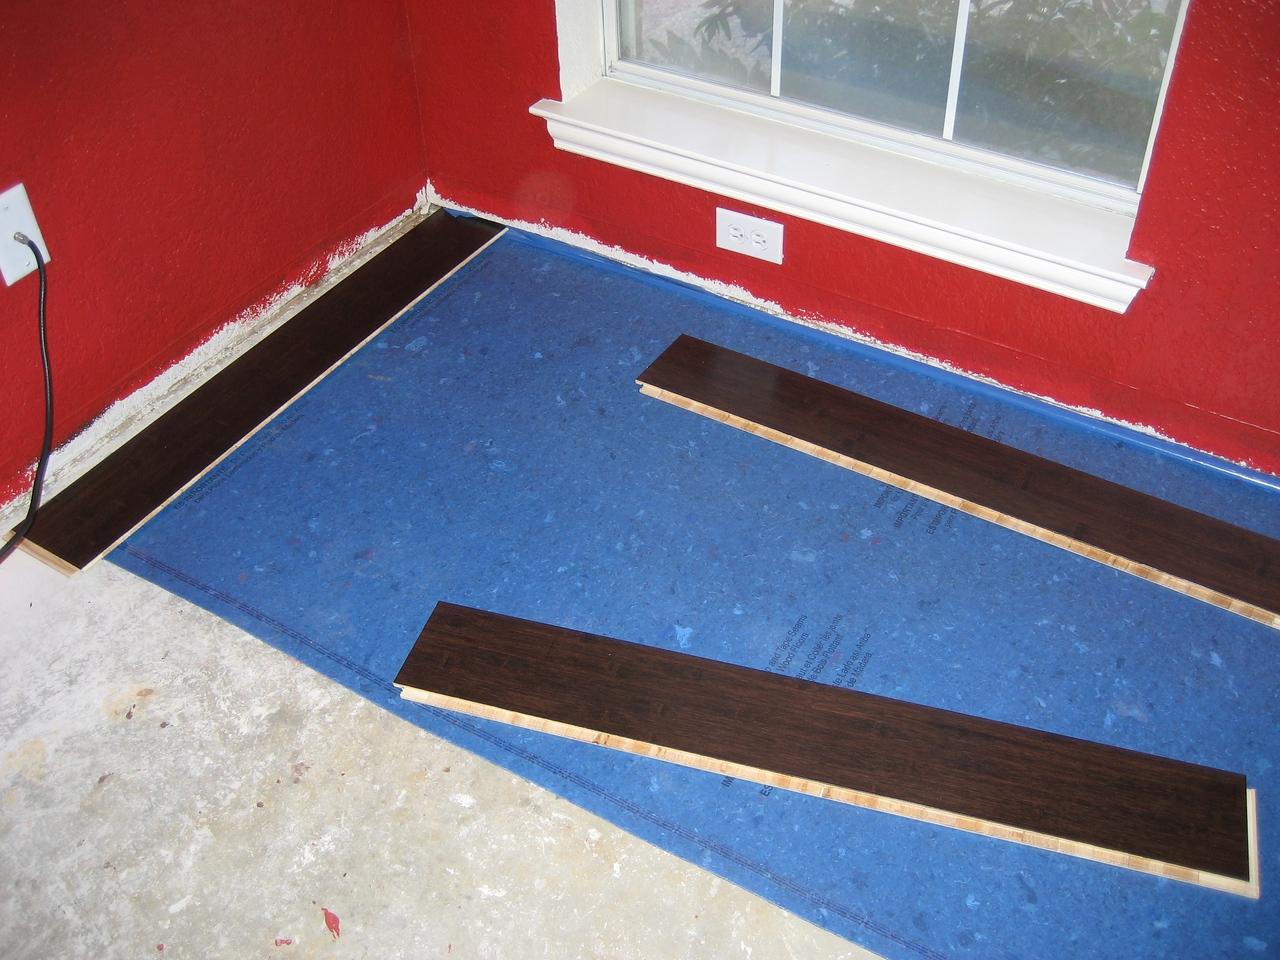 First row of padding, preparing to start flooring.